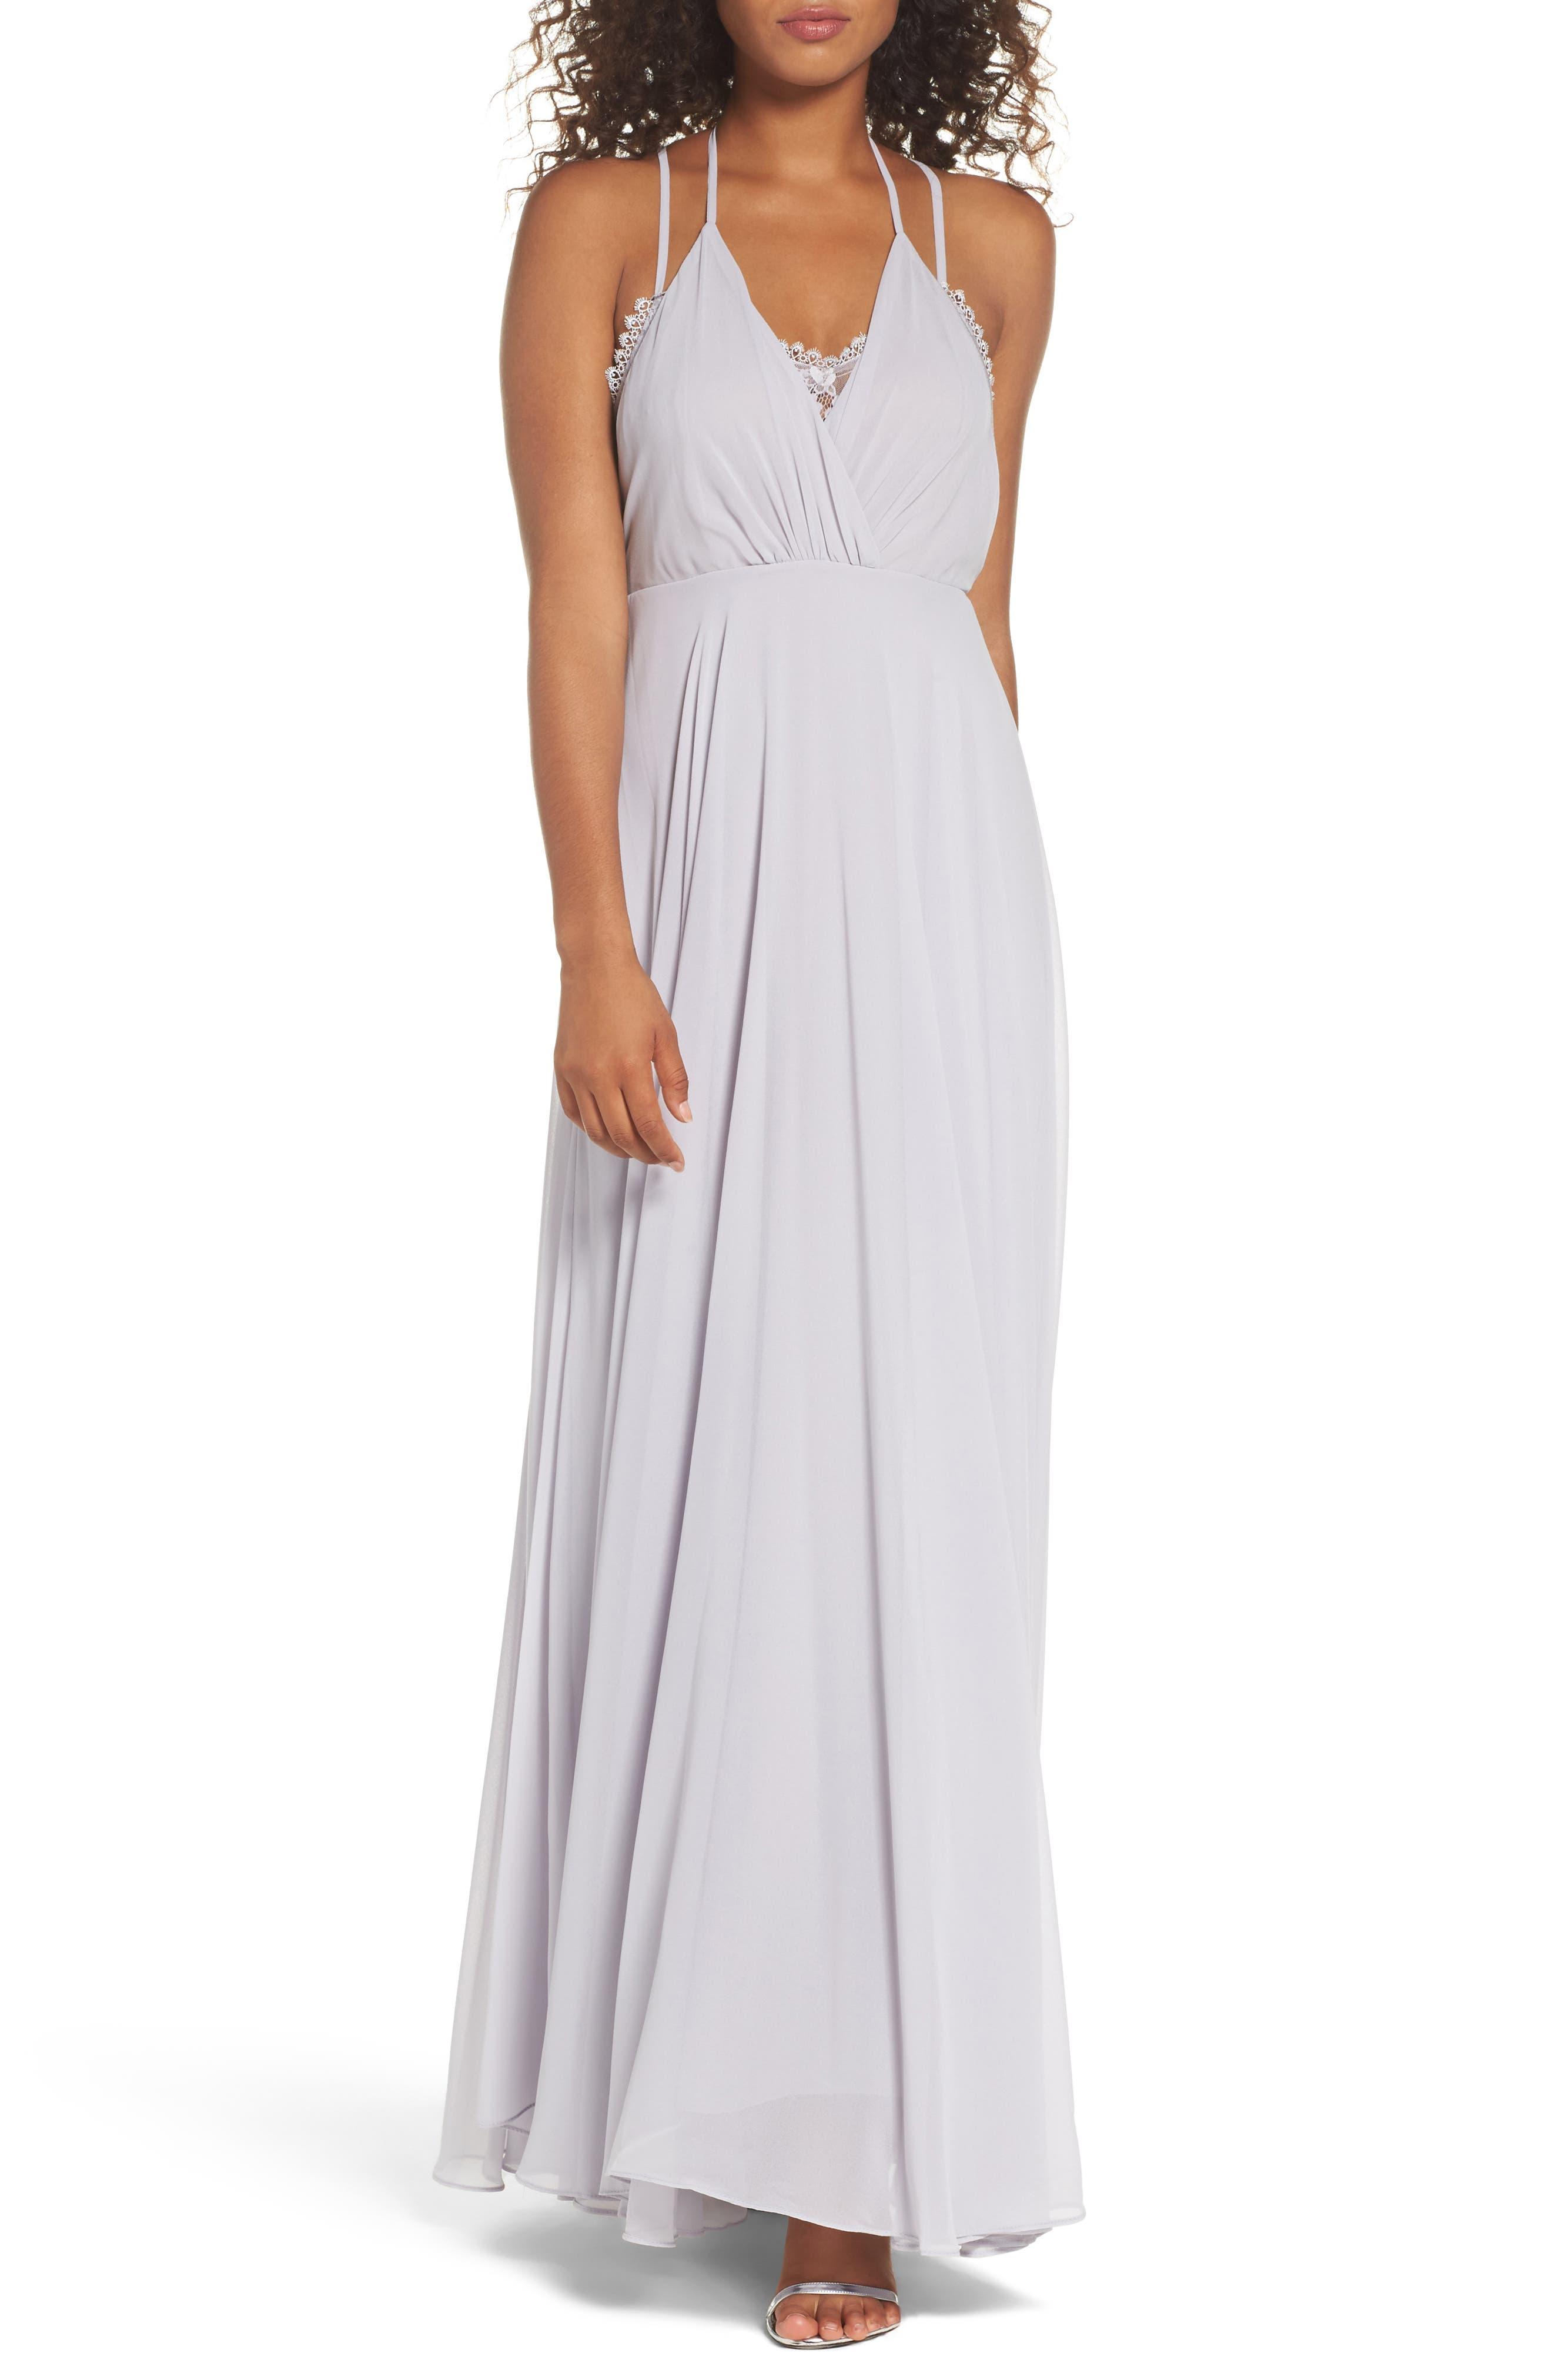 Celebrate the Moment Lace Trim Chiffon Maxi Dress,                             Main thumbnail 1, color,                             020